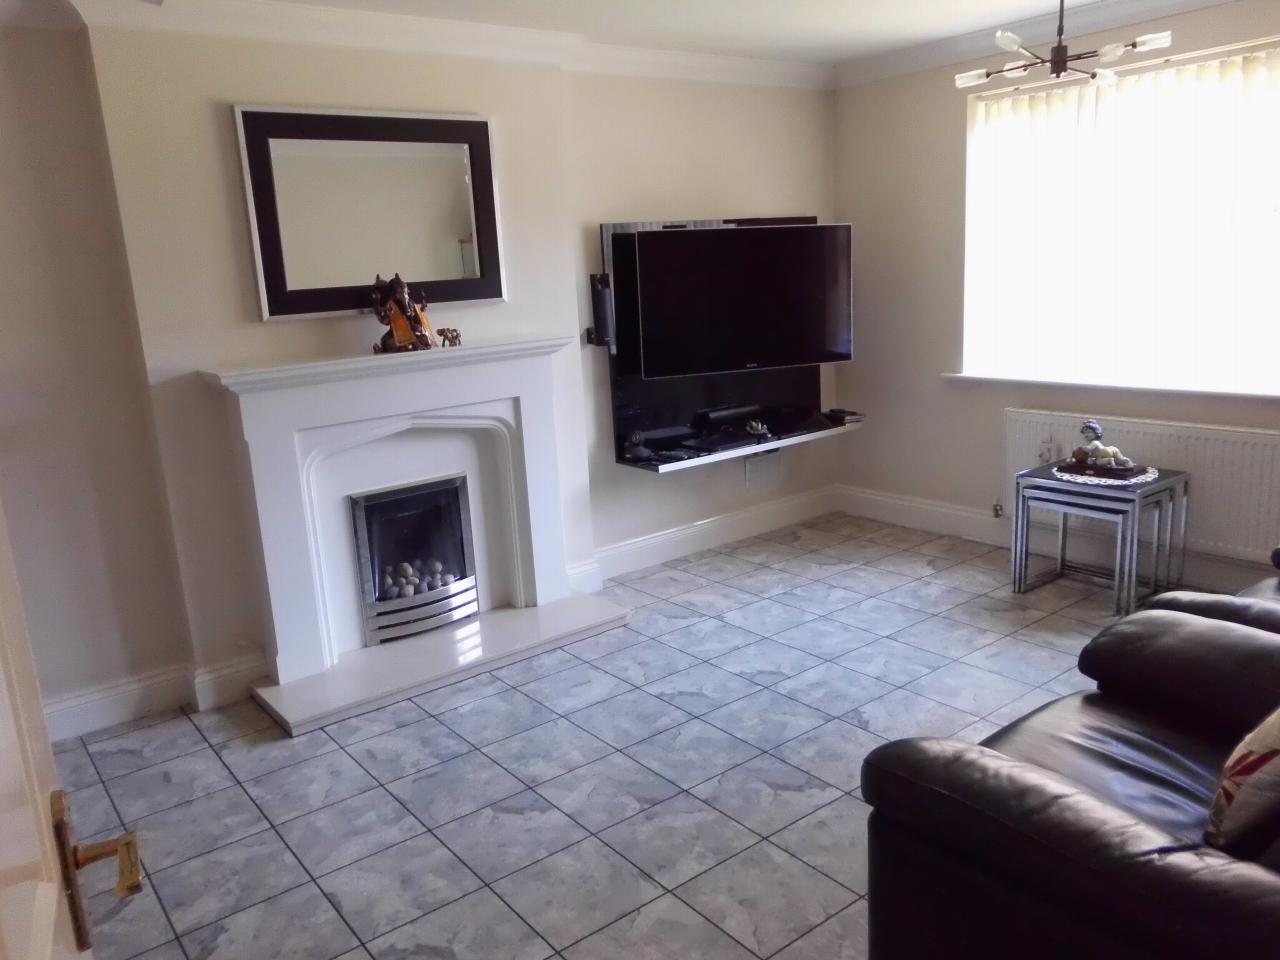 5 Bedroom Detached House For Sale 4 Cransley Close Image 2